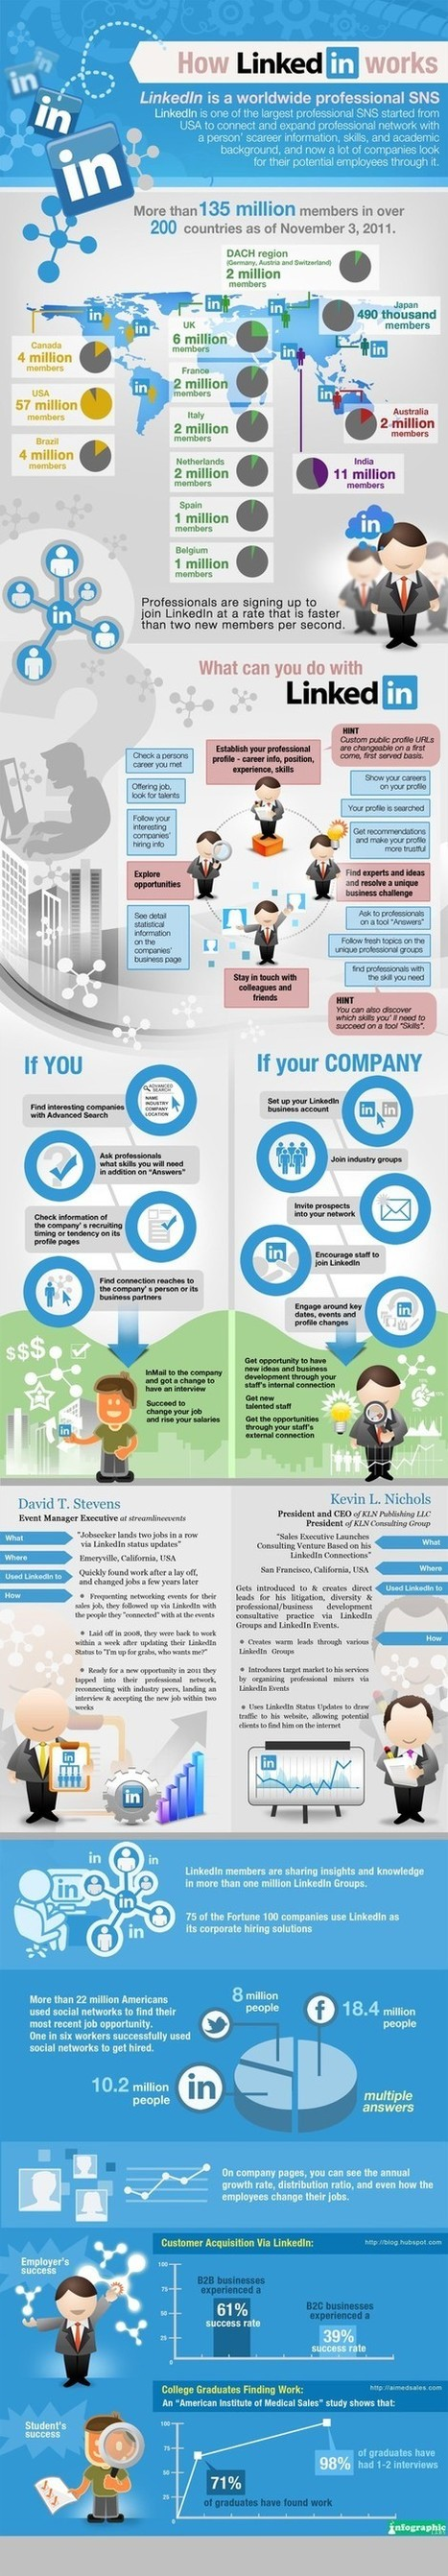 How #LinkedIn Works [INFOGRAPHIC] | LinkedIn Marketing Strategy | Scoop.it